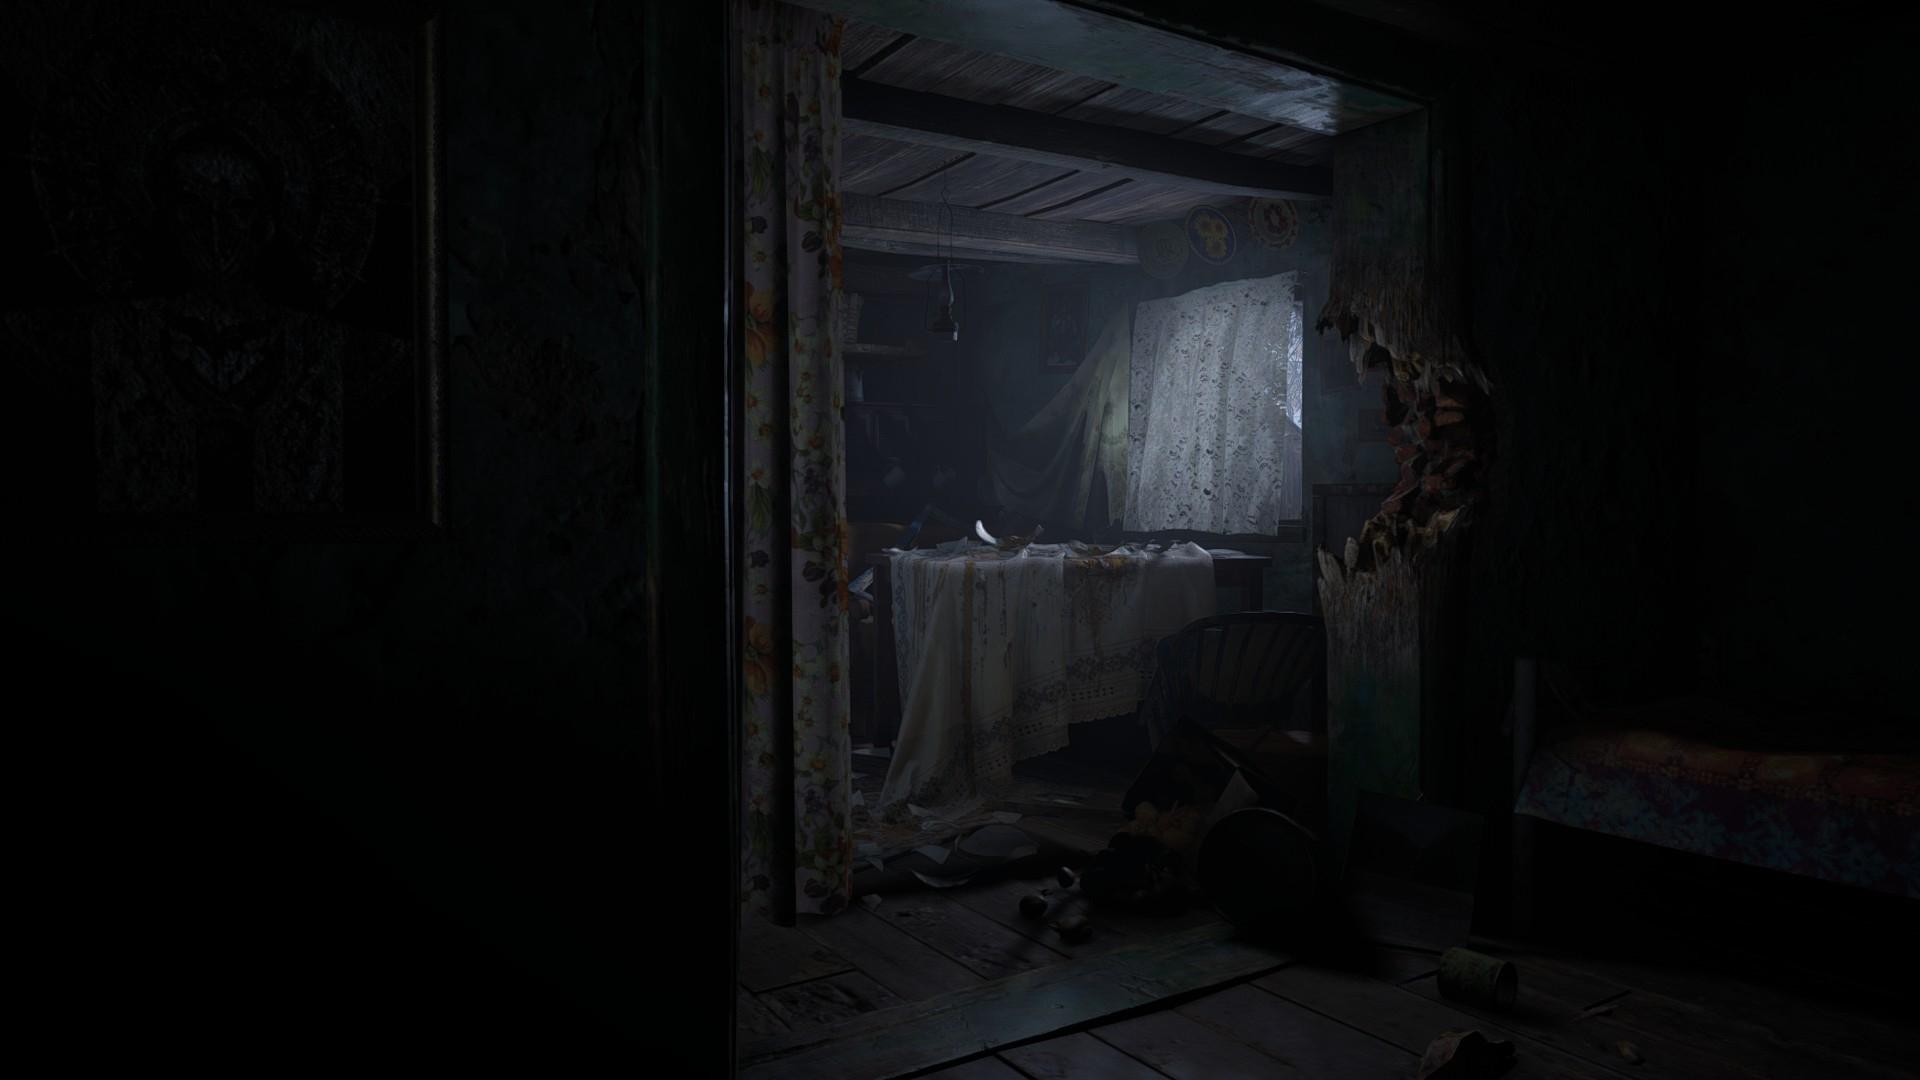 Resident Evil Village Deluxe Edition - Launch   ROW (f62c1b86-7e9a-49eb-8164-f16321ebd836)